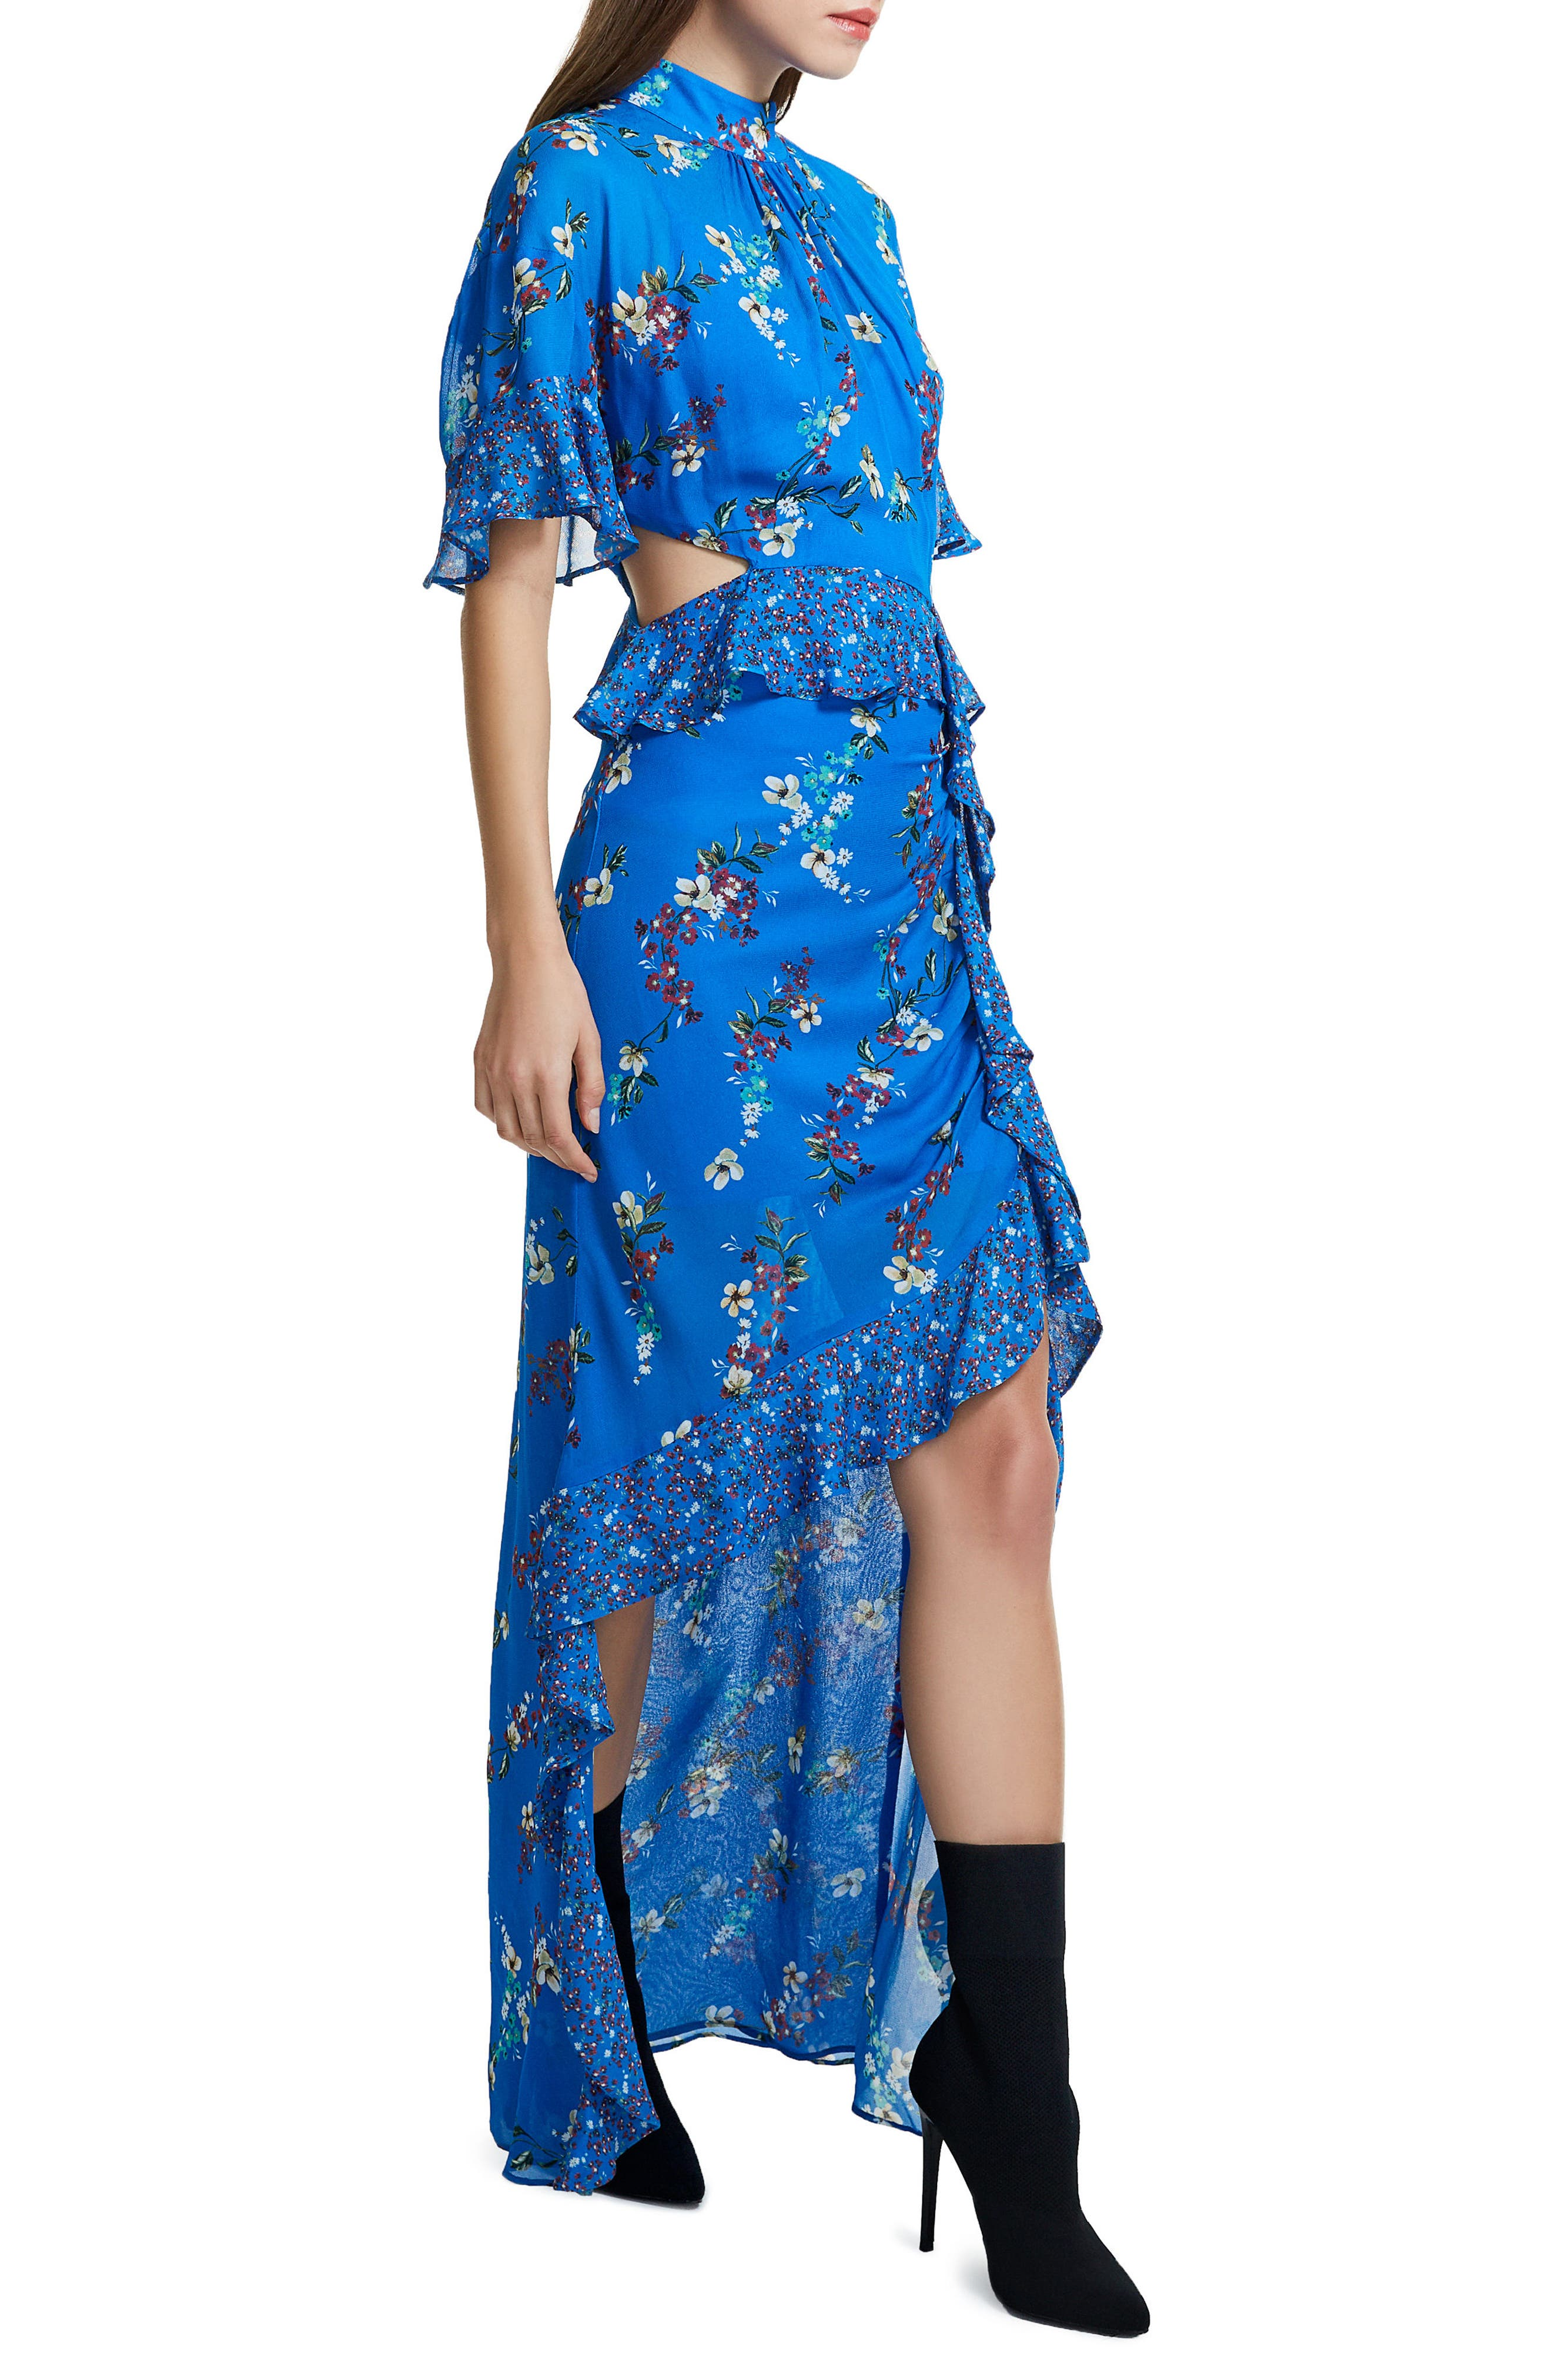 Melsa Cutout Maxi Dress,                             Alternate thumbnail 6, color,